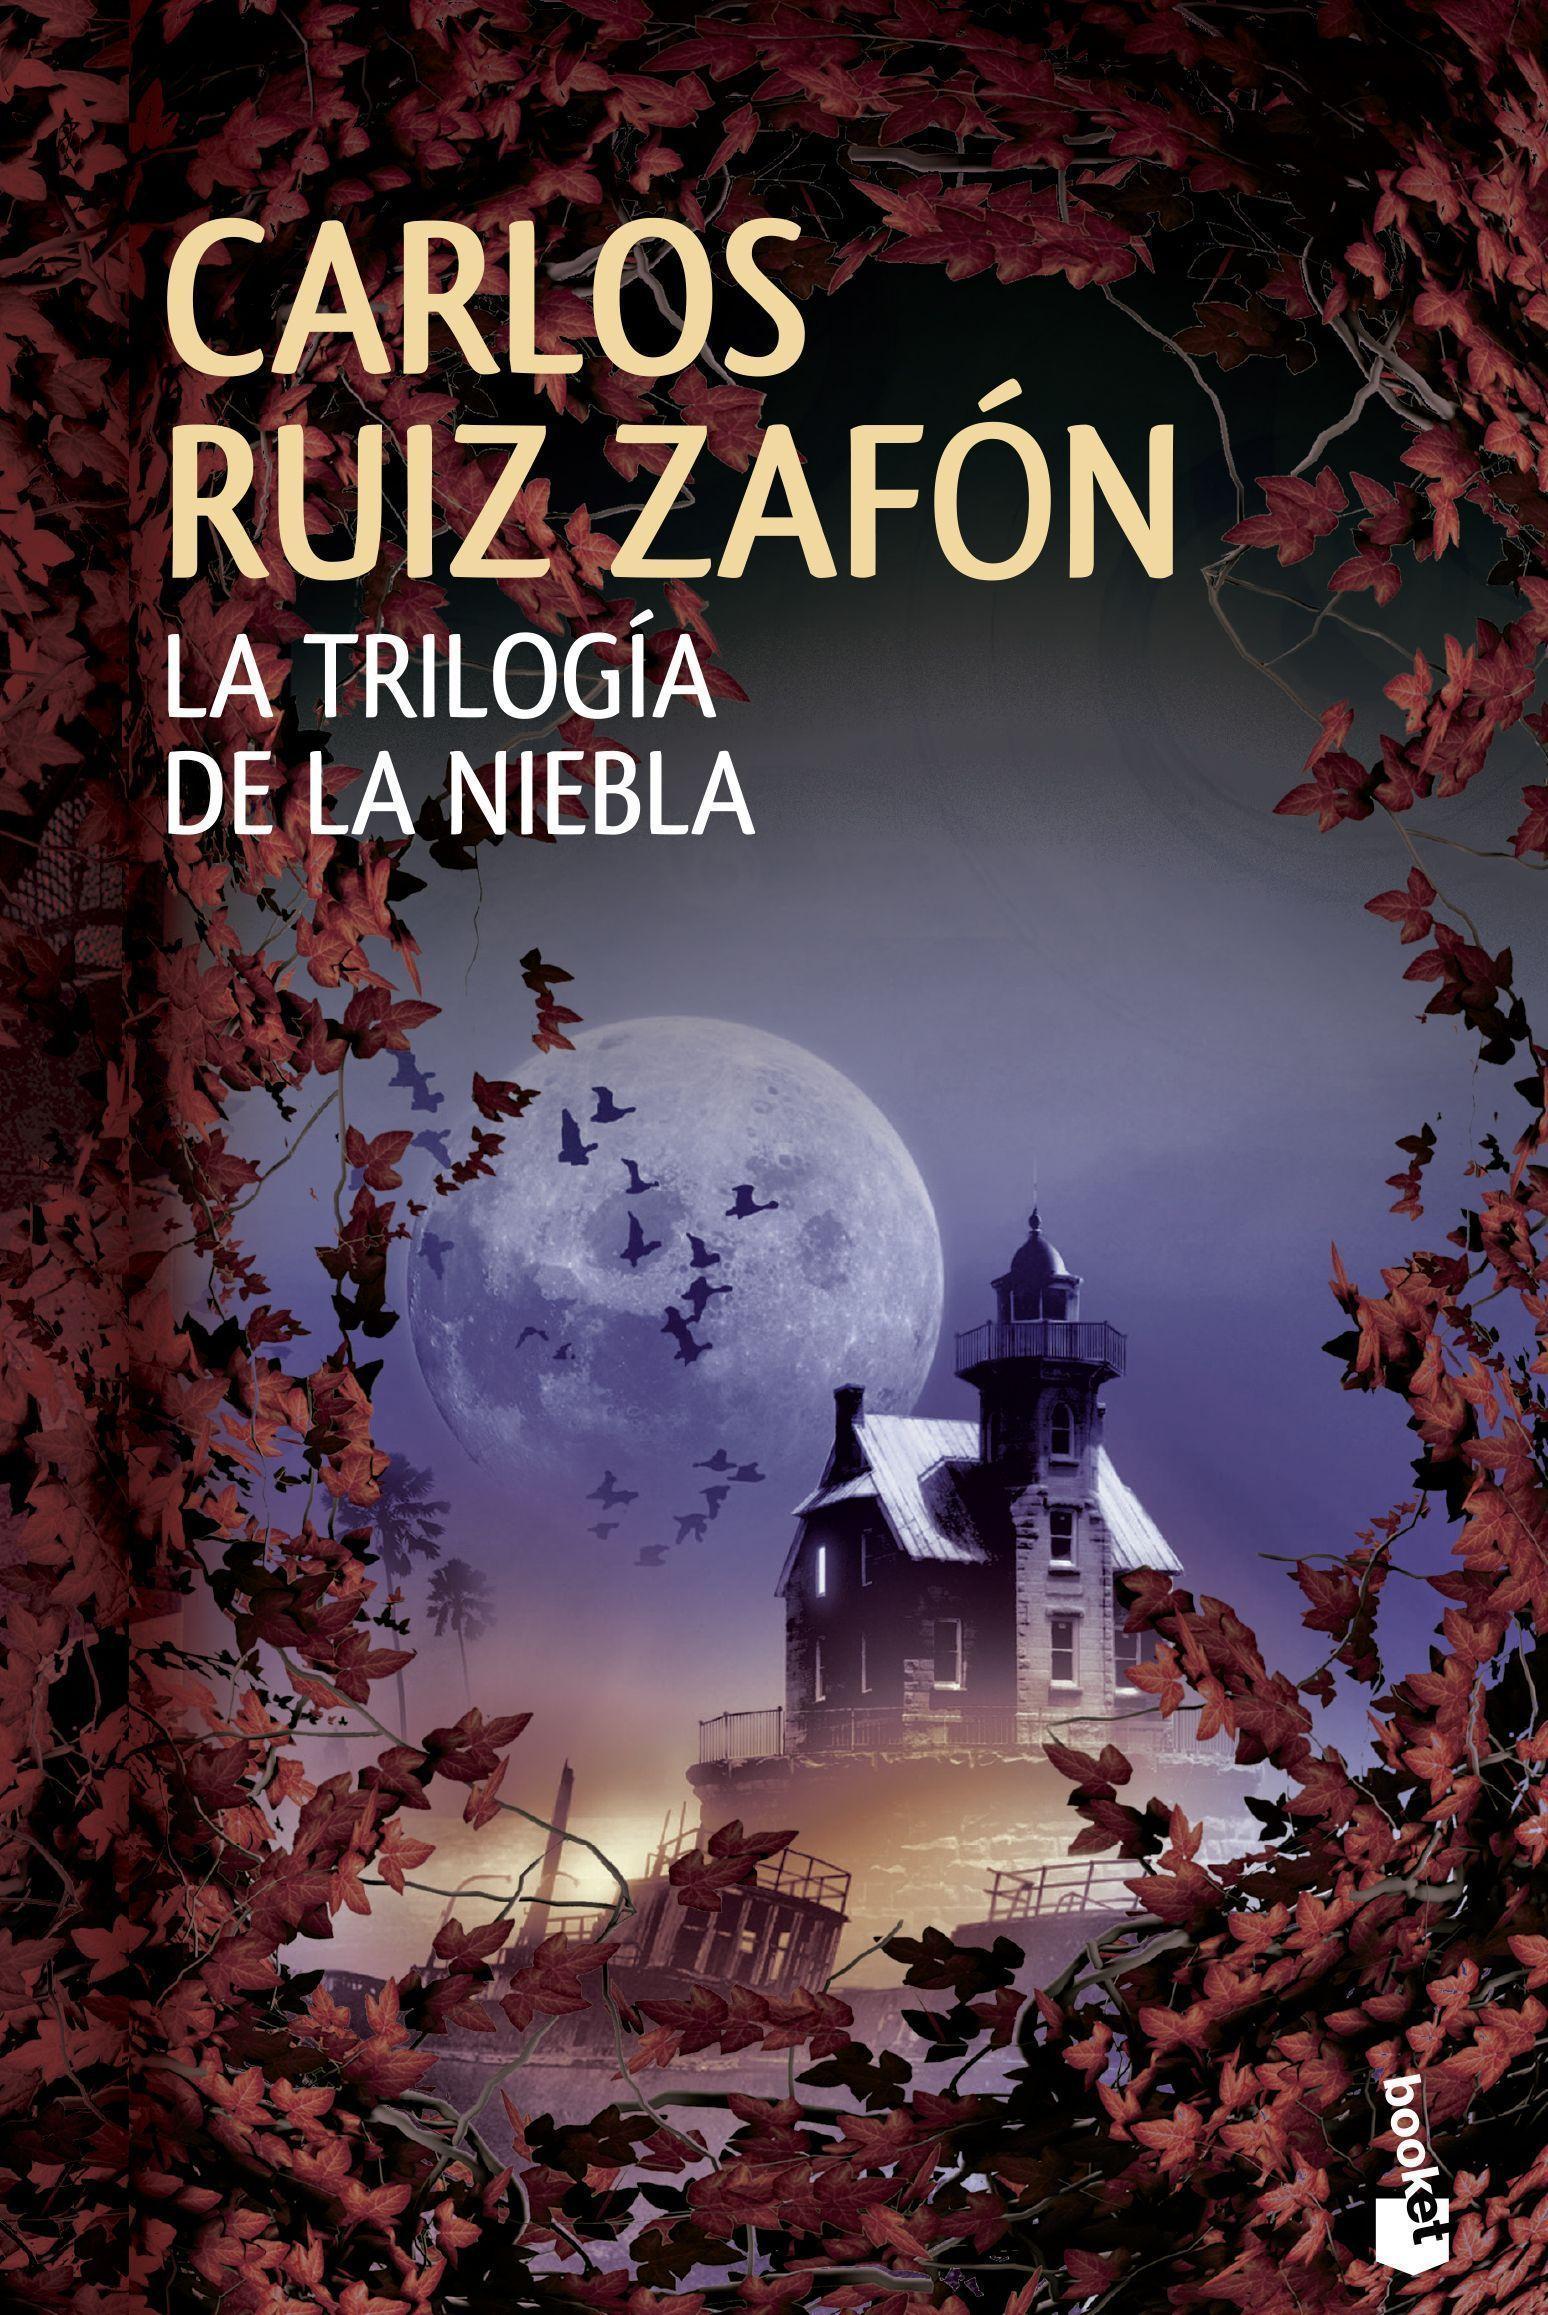 9788408133148 Jpg 1 548 2 315 Píxeles Carlos Ruiz Zafon Libros Libros De Suspenso Libros De Lectura Gratis